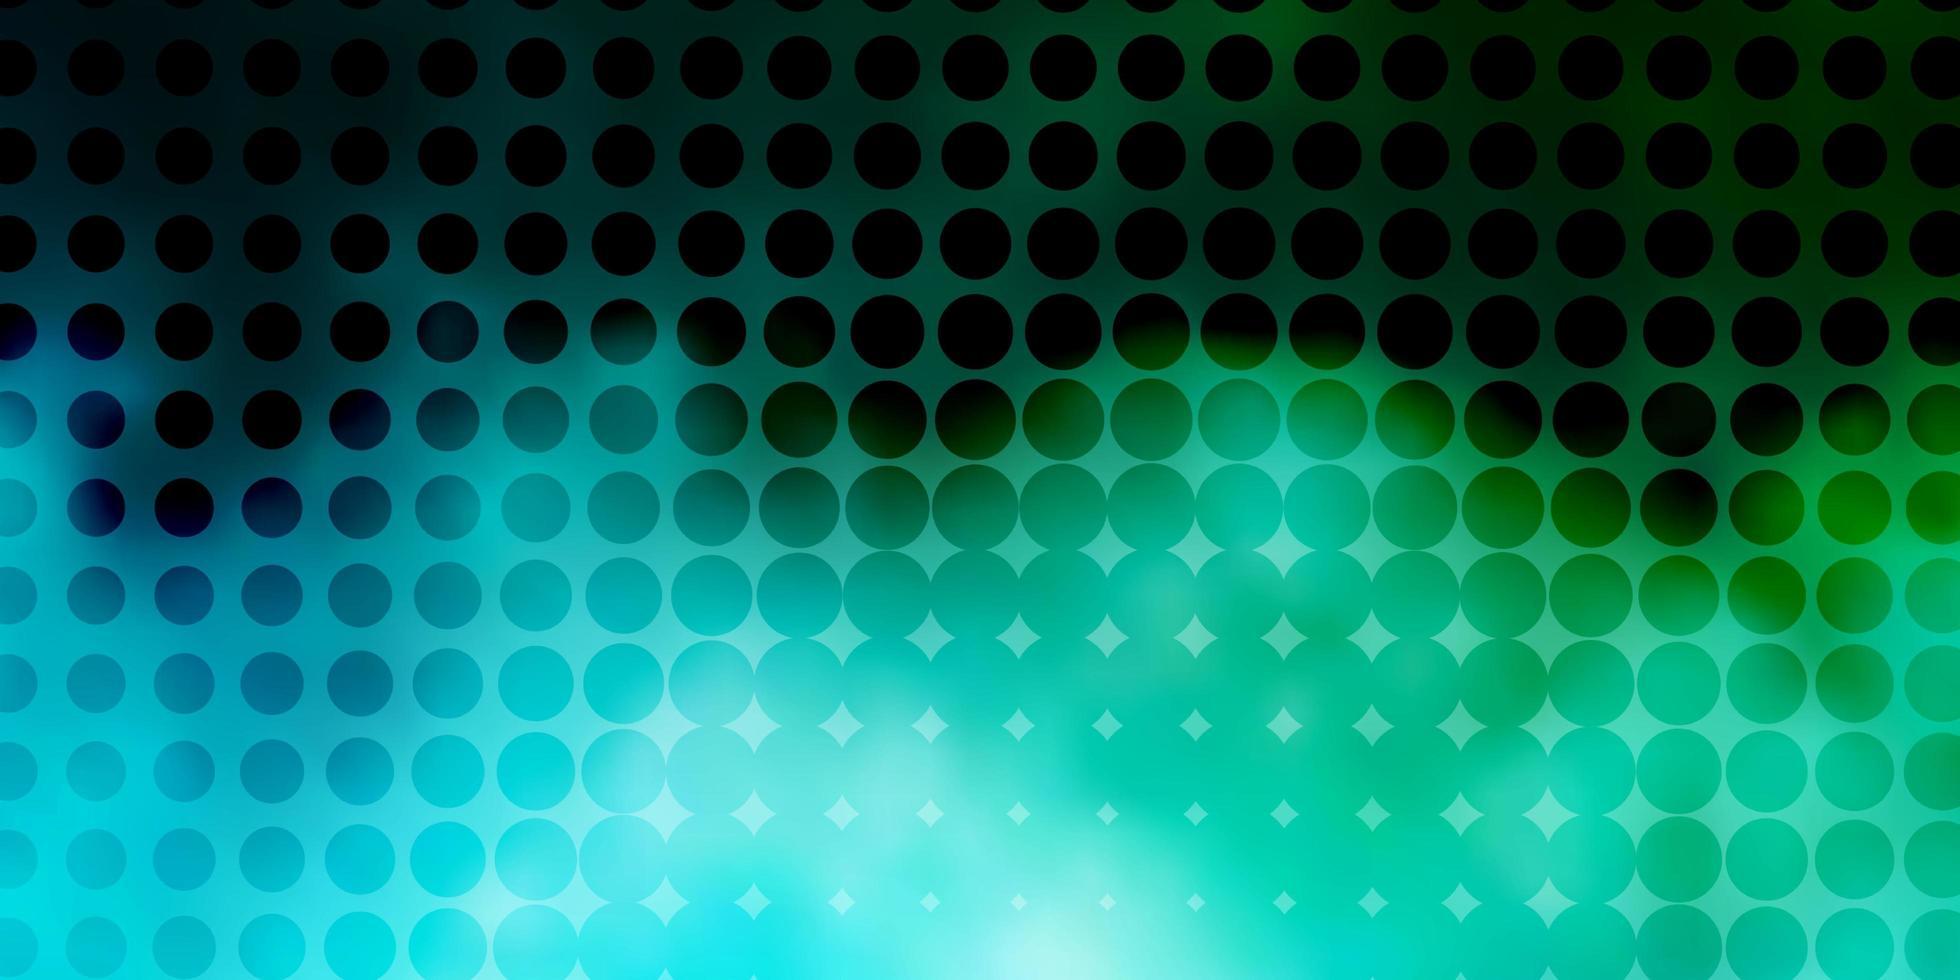 lichtblauwe, groene vectorlay-out met cirkelvormen. vector